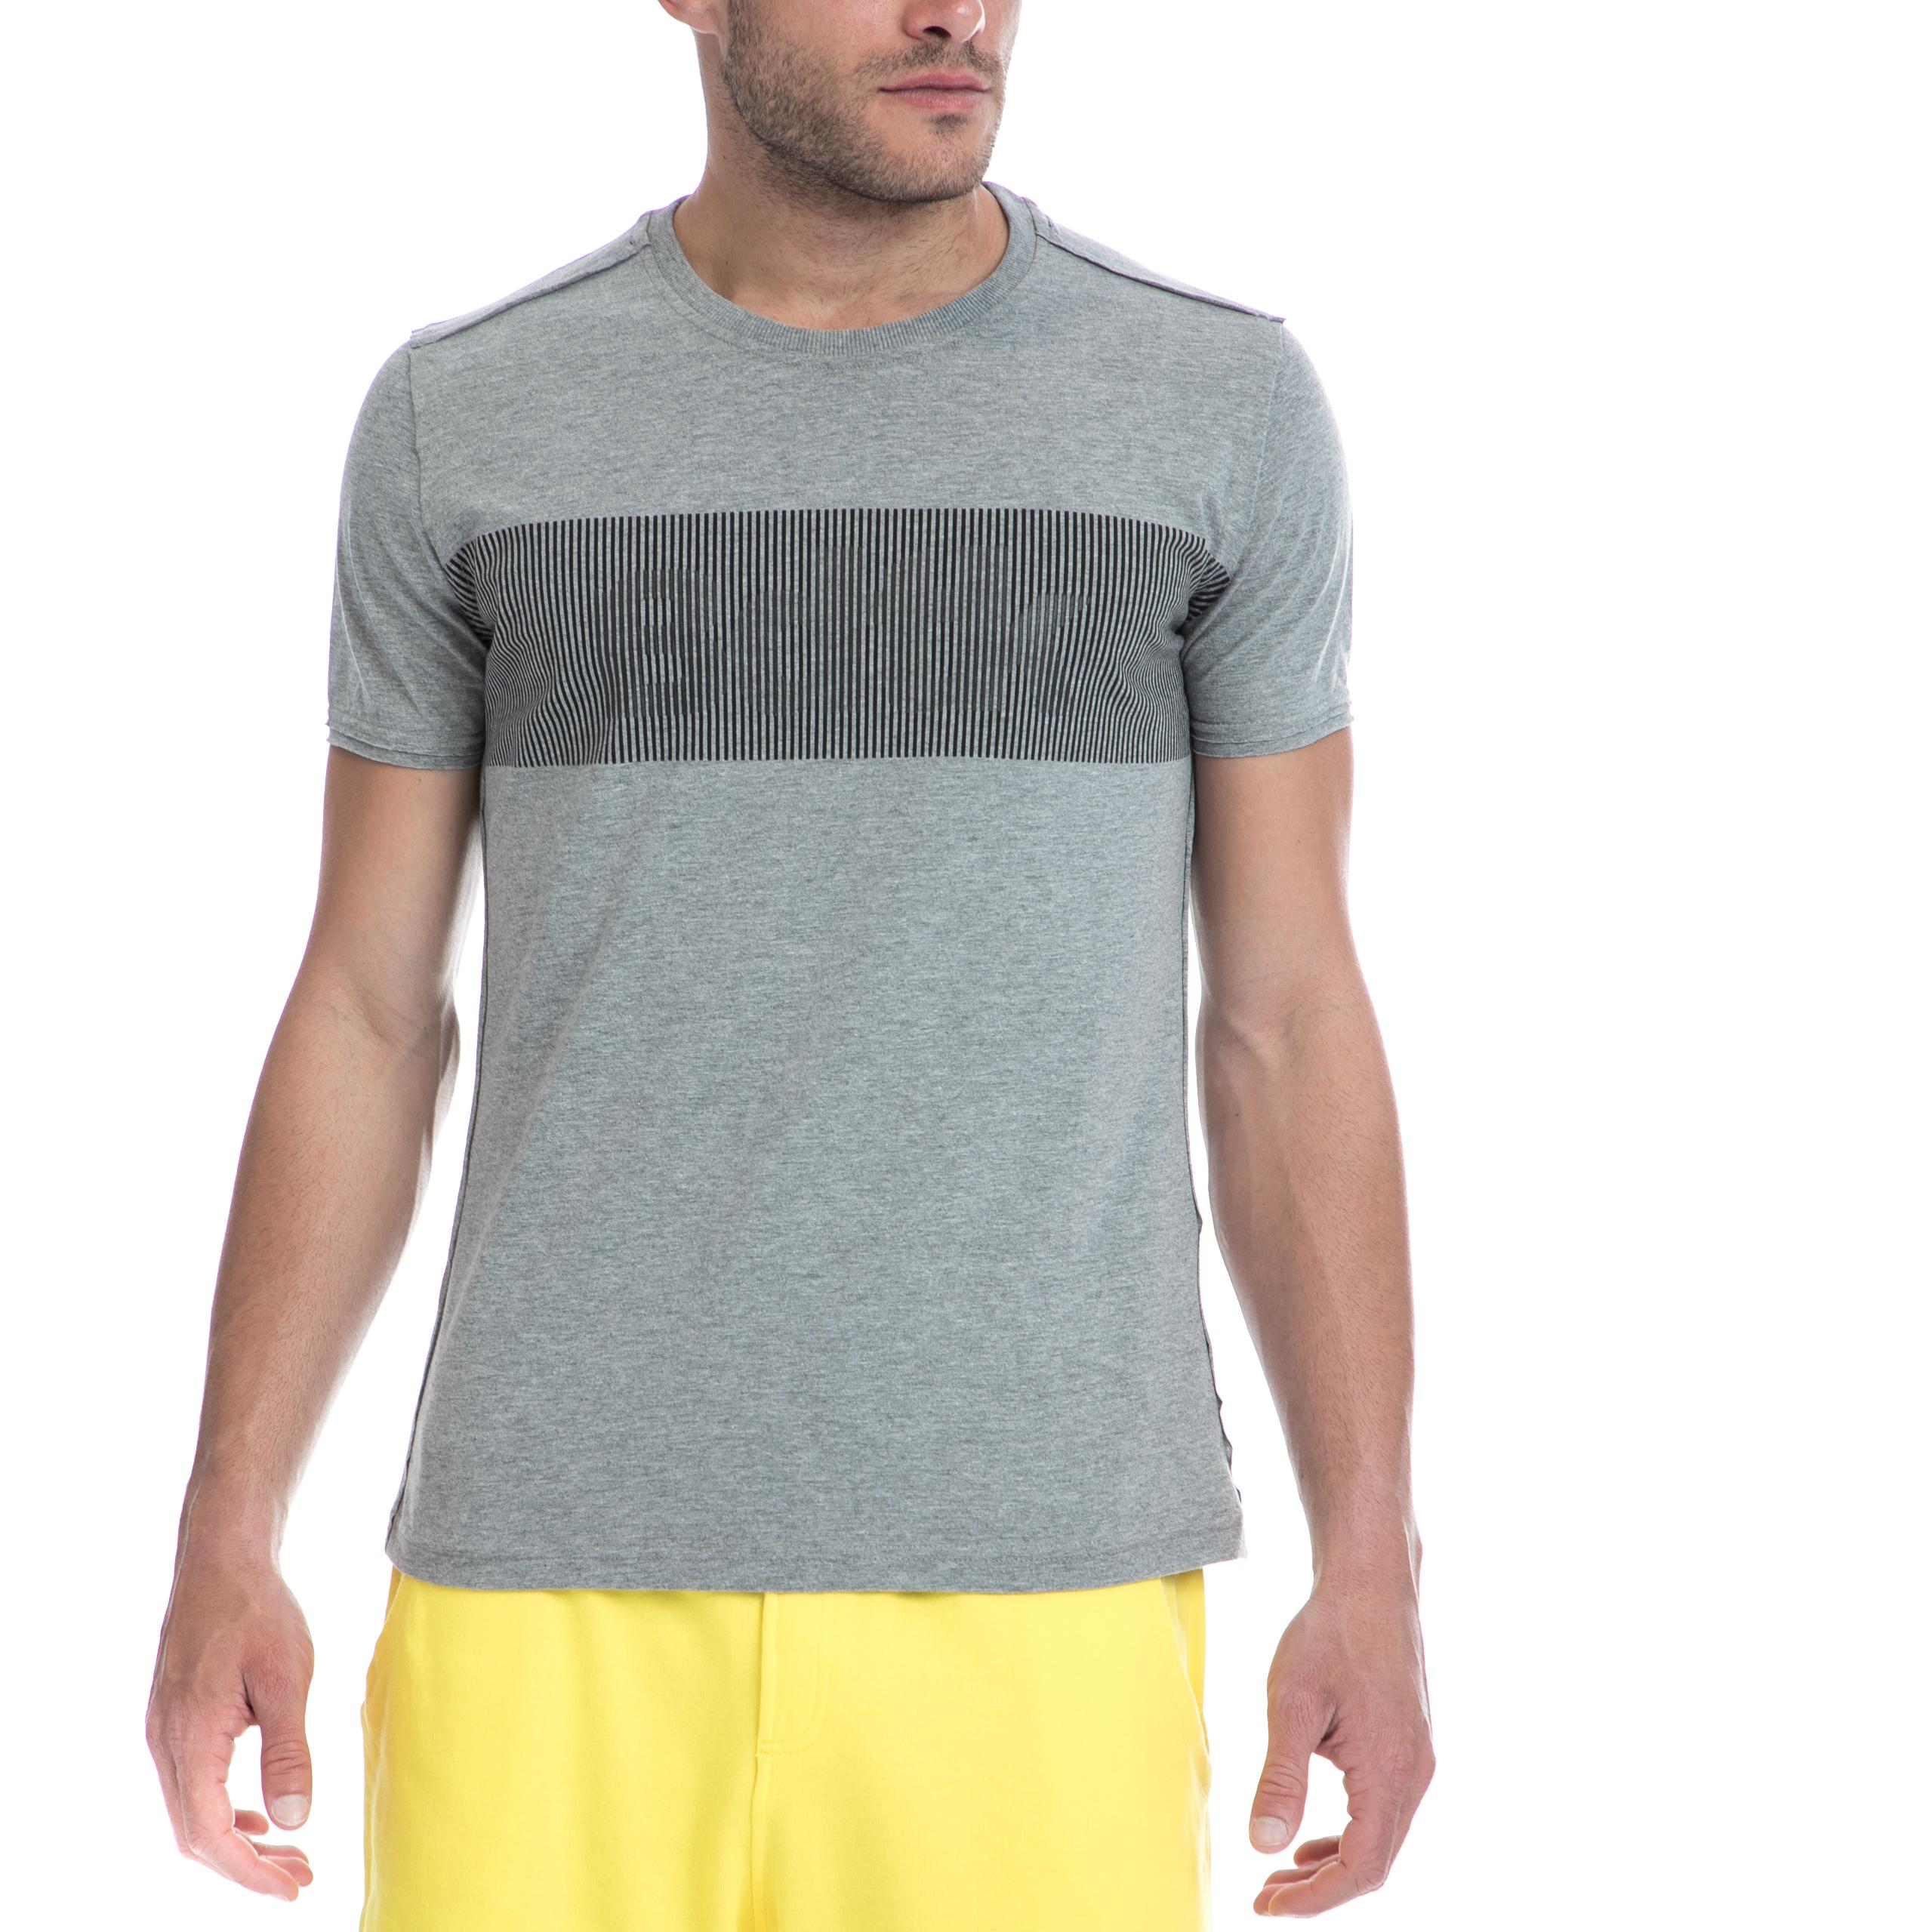 BODYTALK - Ανδρική μπλούζα BODYTALK γκρι ανδρικά ρούχα αθλητικά t shirt